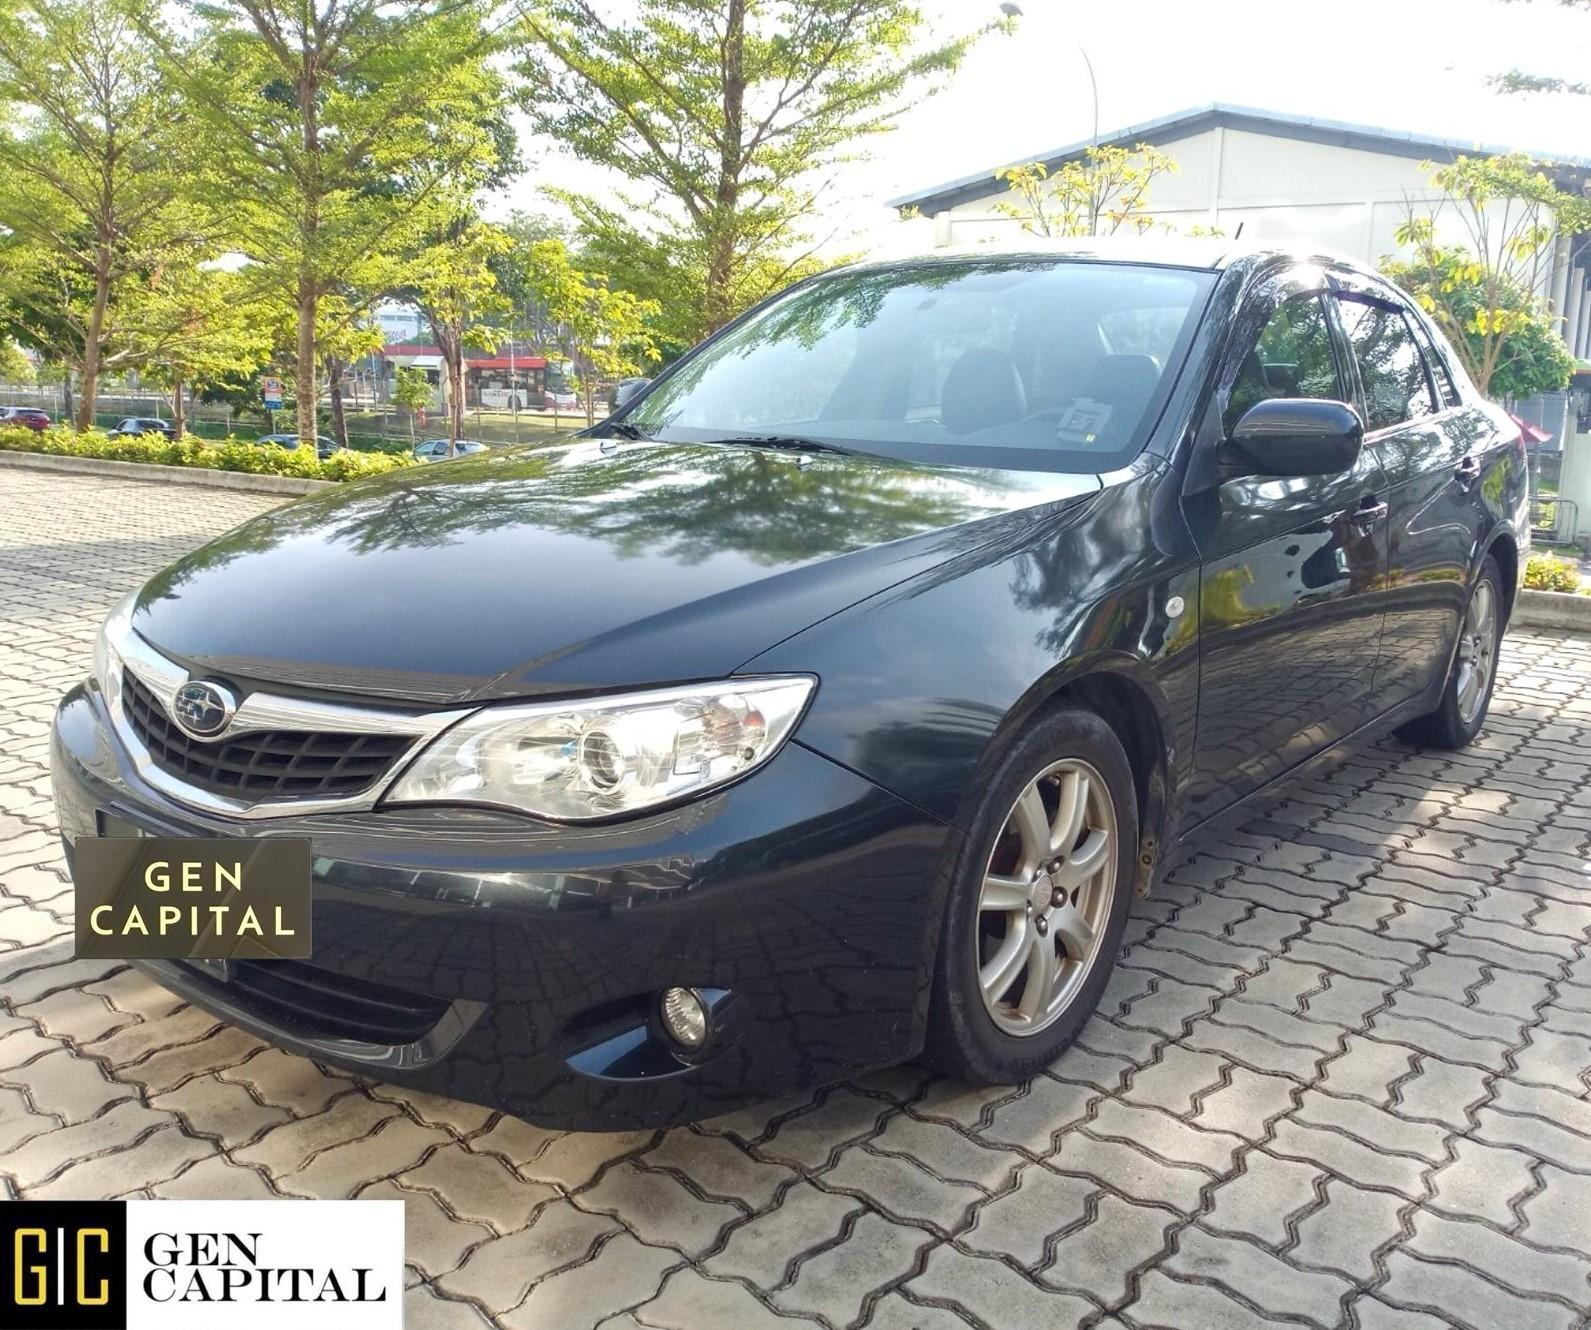 Subaru Impreza 1.5A sedan - Cheapest rental in city, quickest assistance!